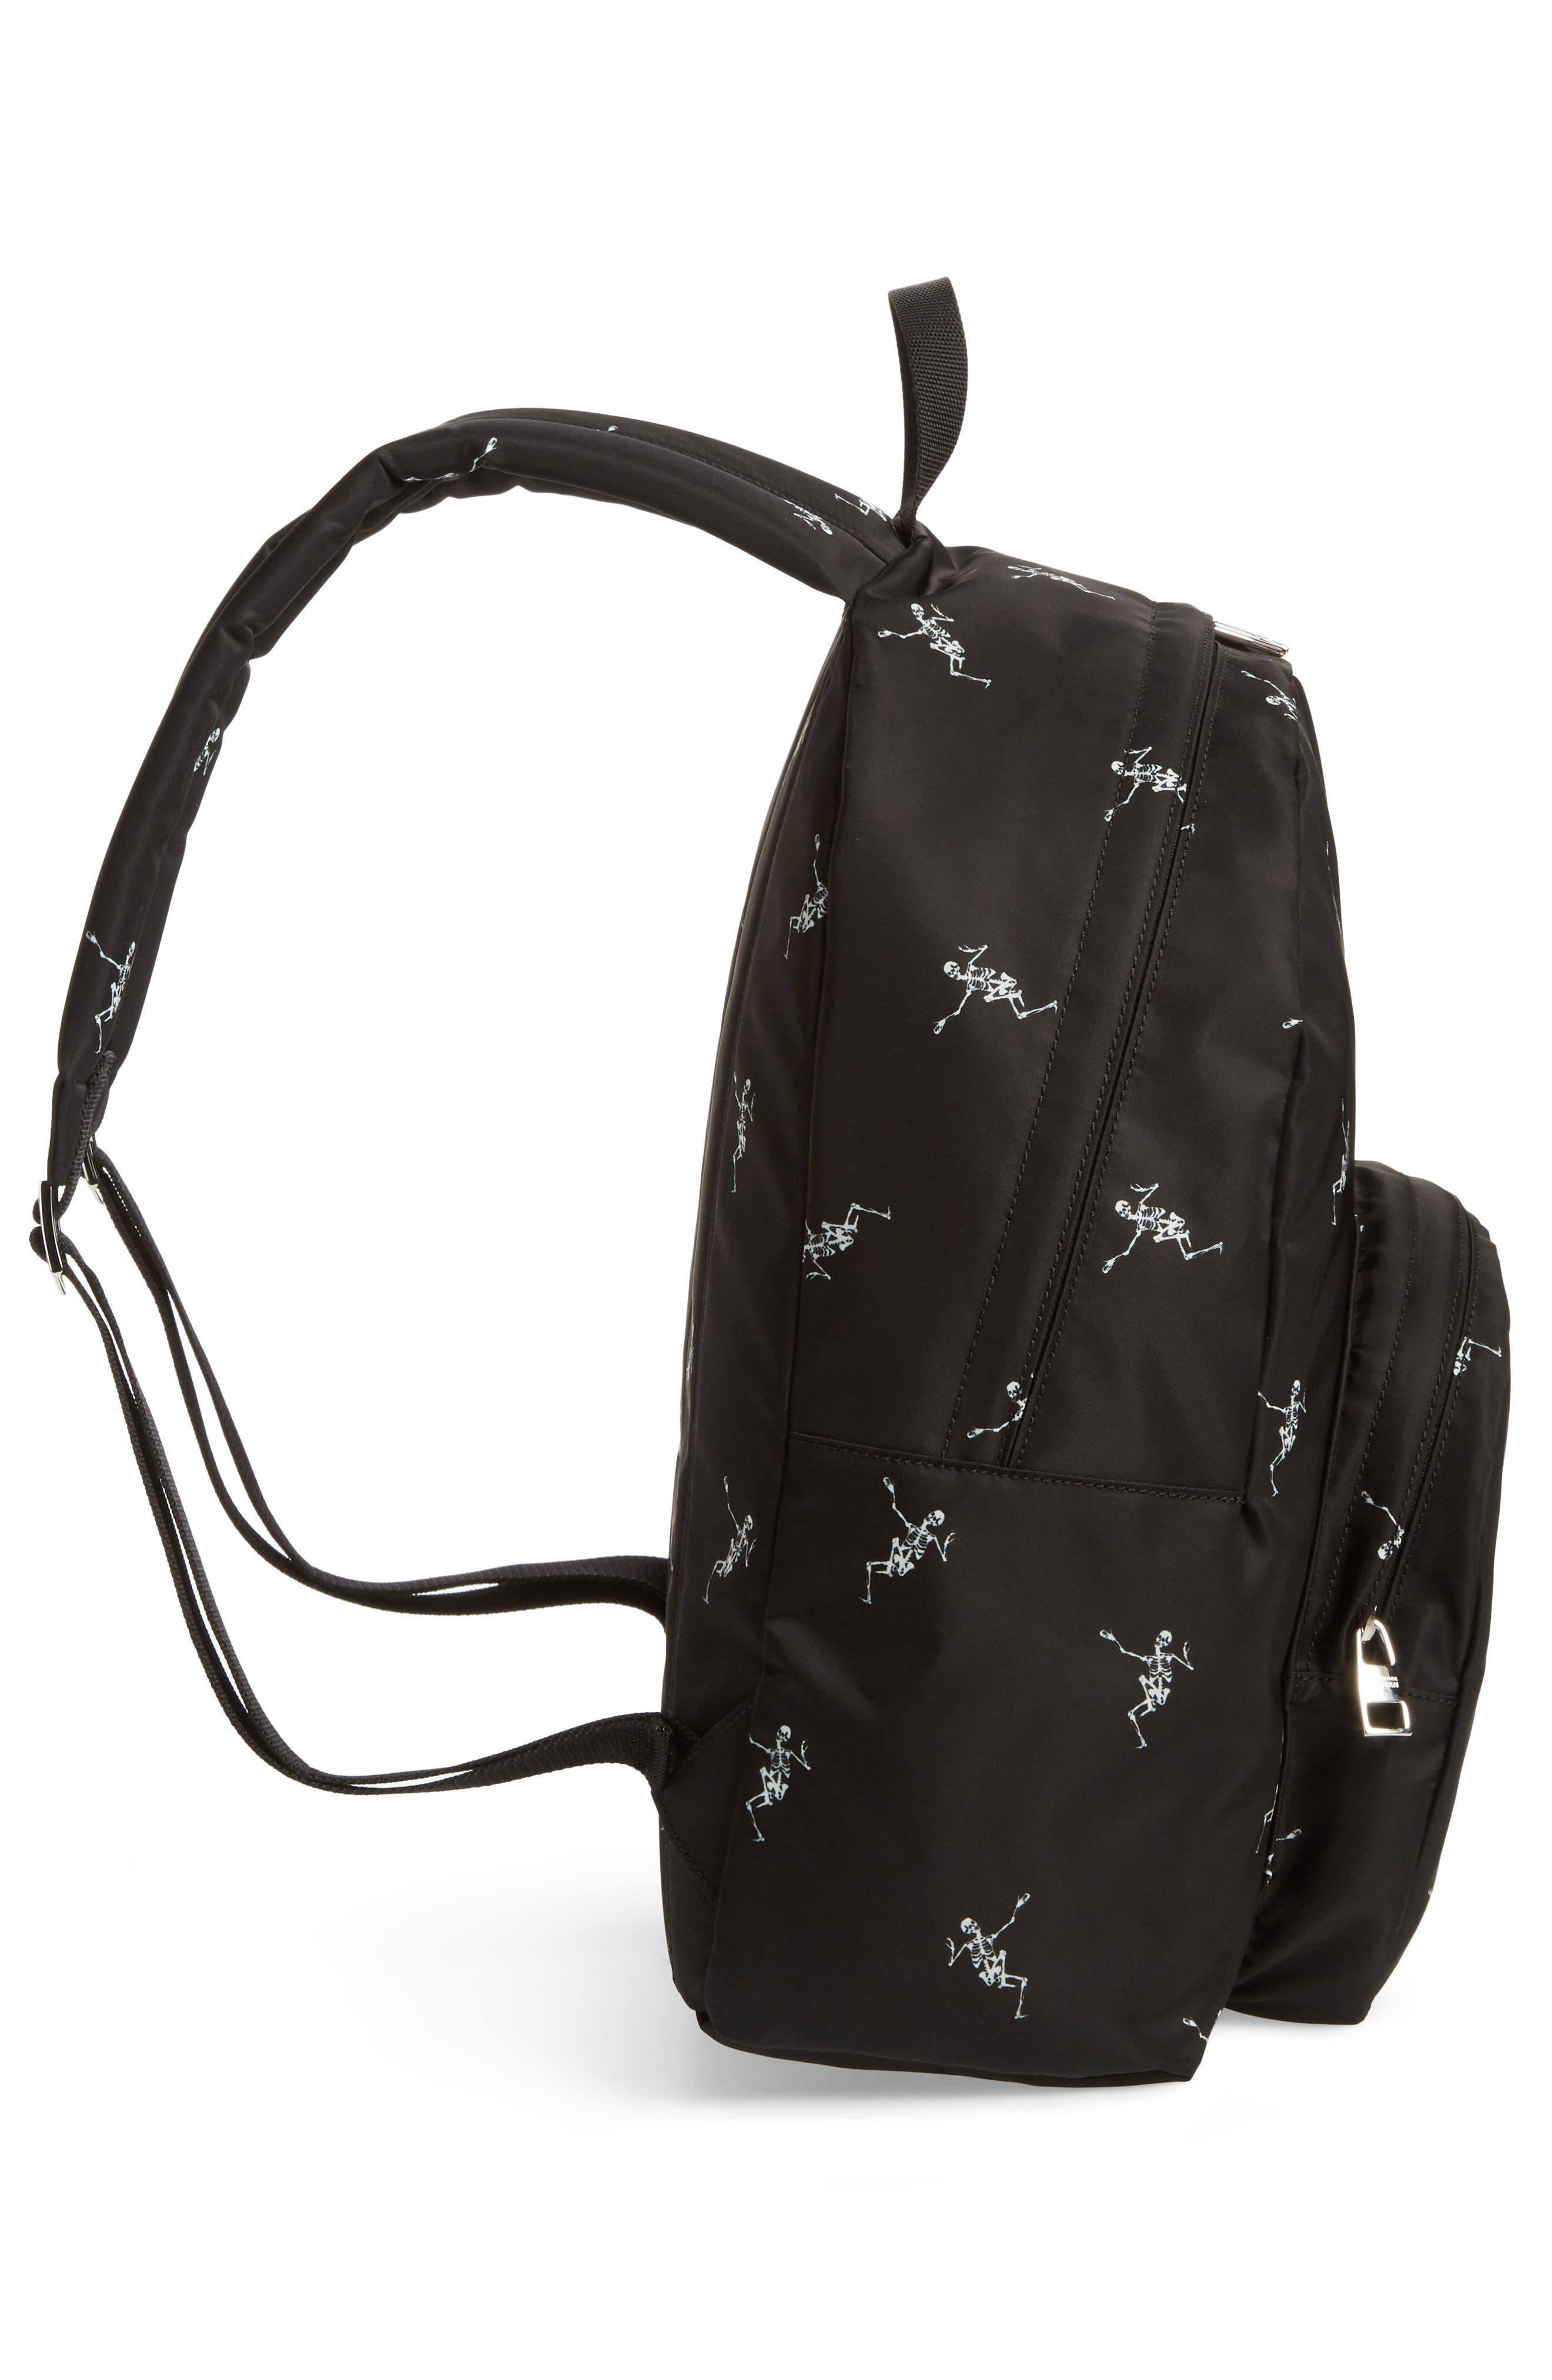 Dancing Skeleton Backpack,                             Alternate thumbnail 5, color,                             BLACK/ OFF WHITE